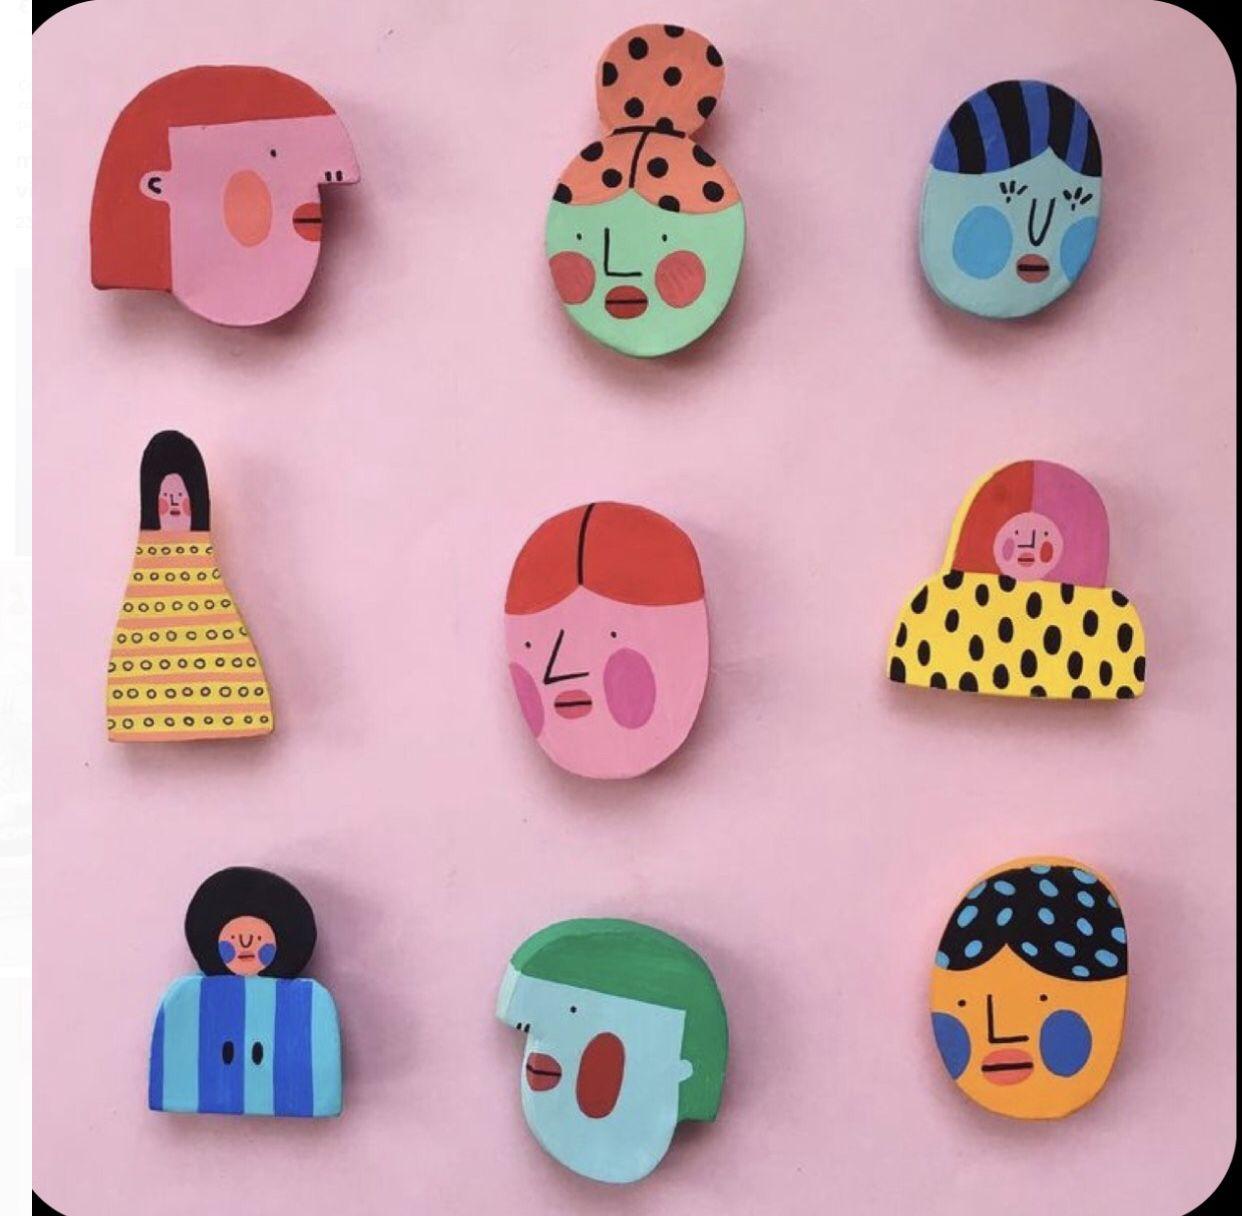 Handmade Clay Pin Backpack Pin Fire Clay Pins Polymer Clay Pin